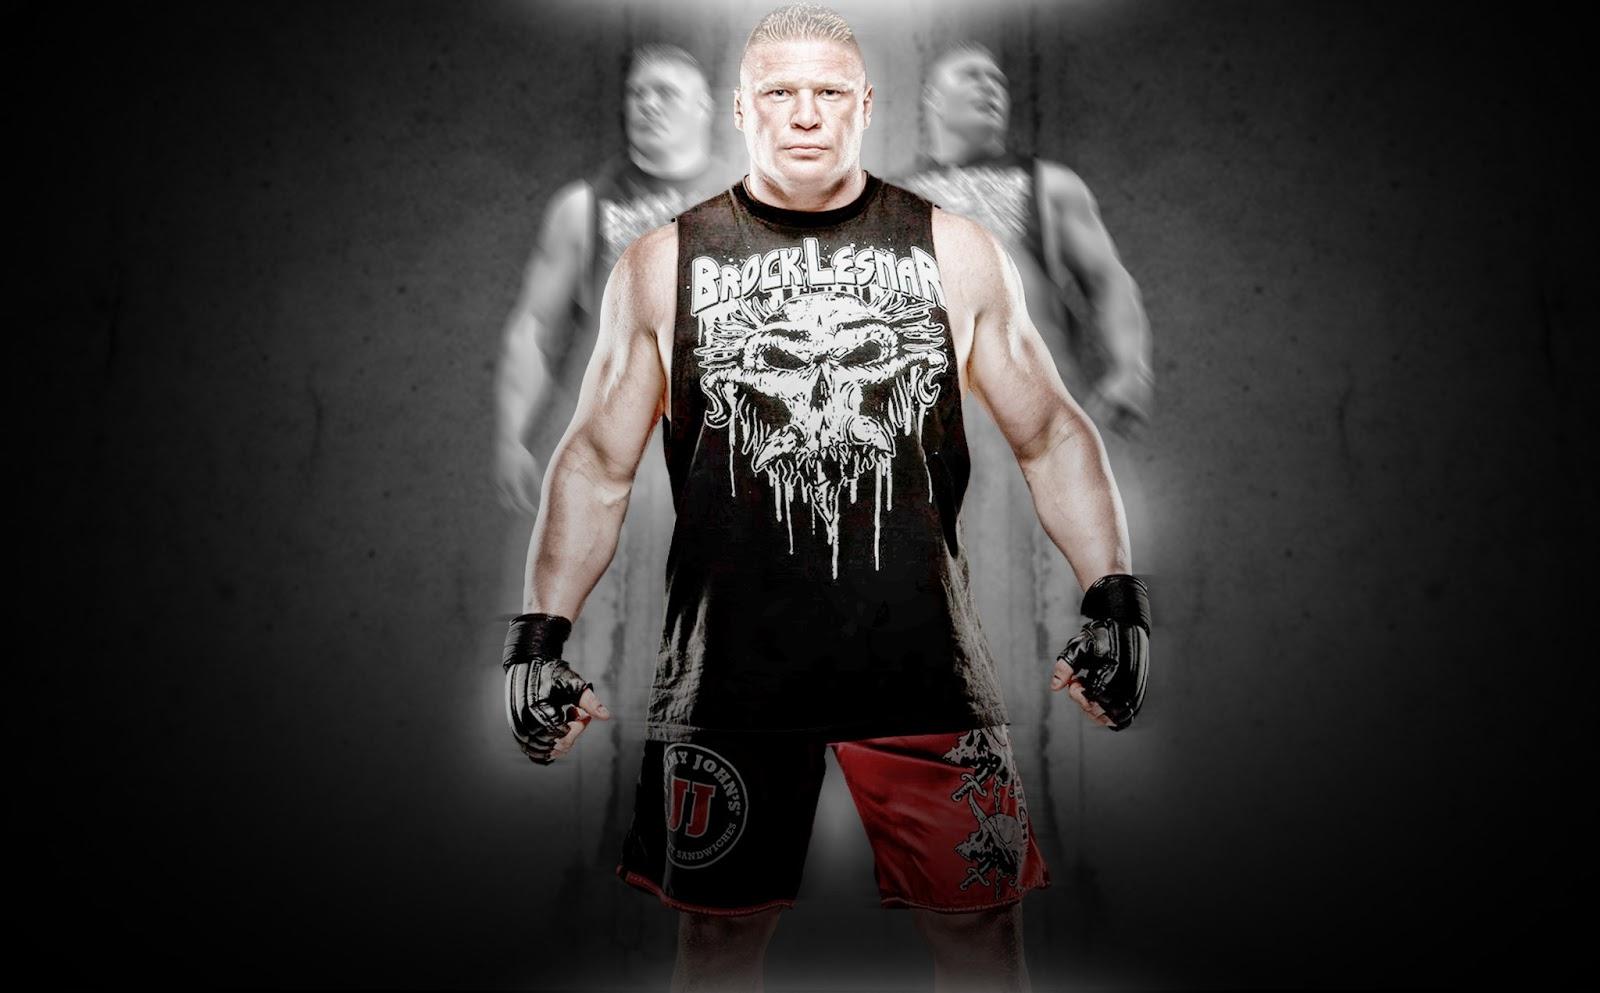 Brock Lesnar Wallpaper Full HD 1600x993